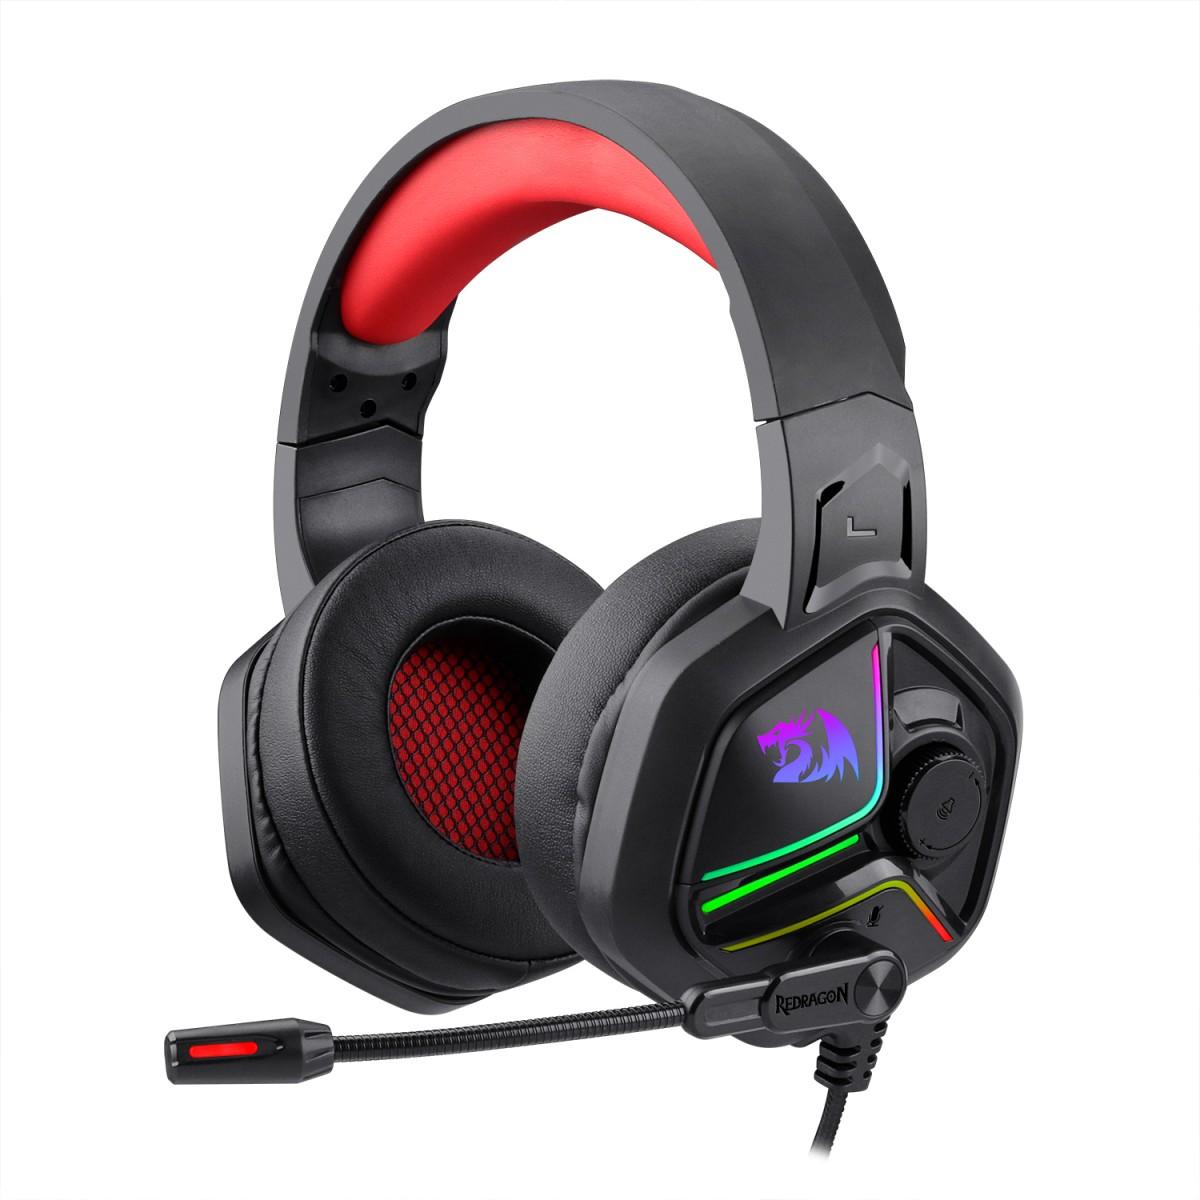 Headset Gamer Redragon Ajax H230, Preto, H230